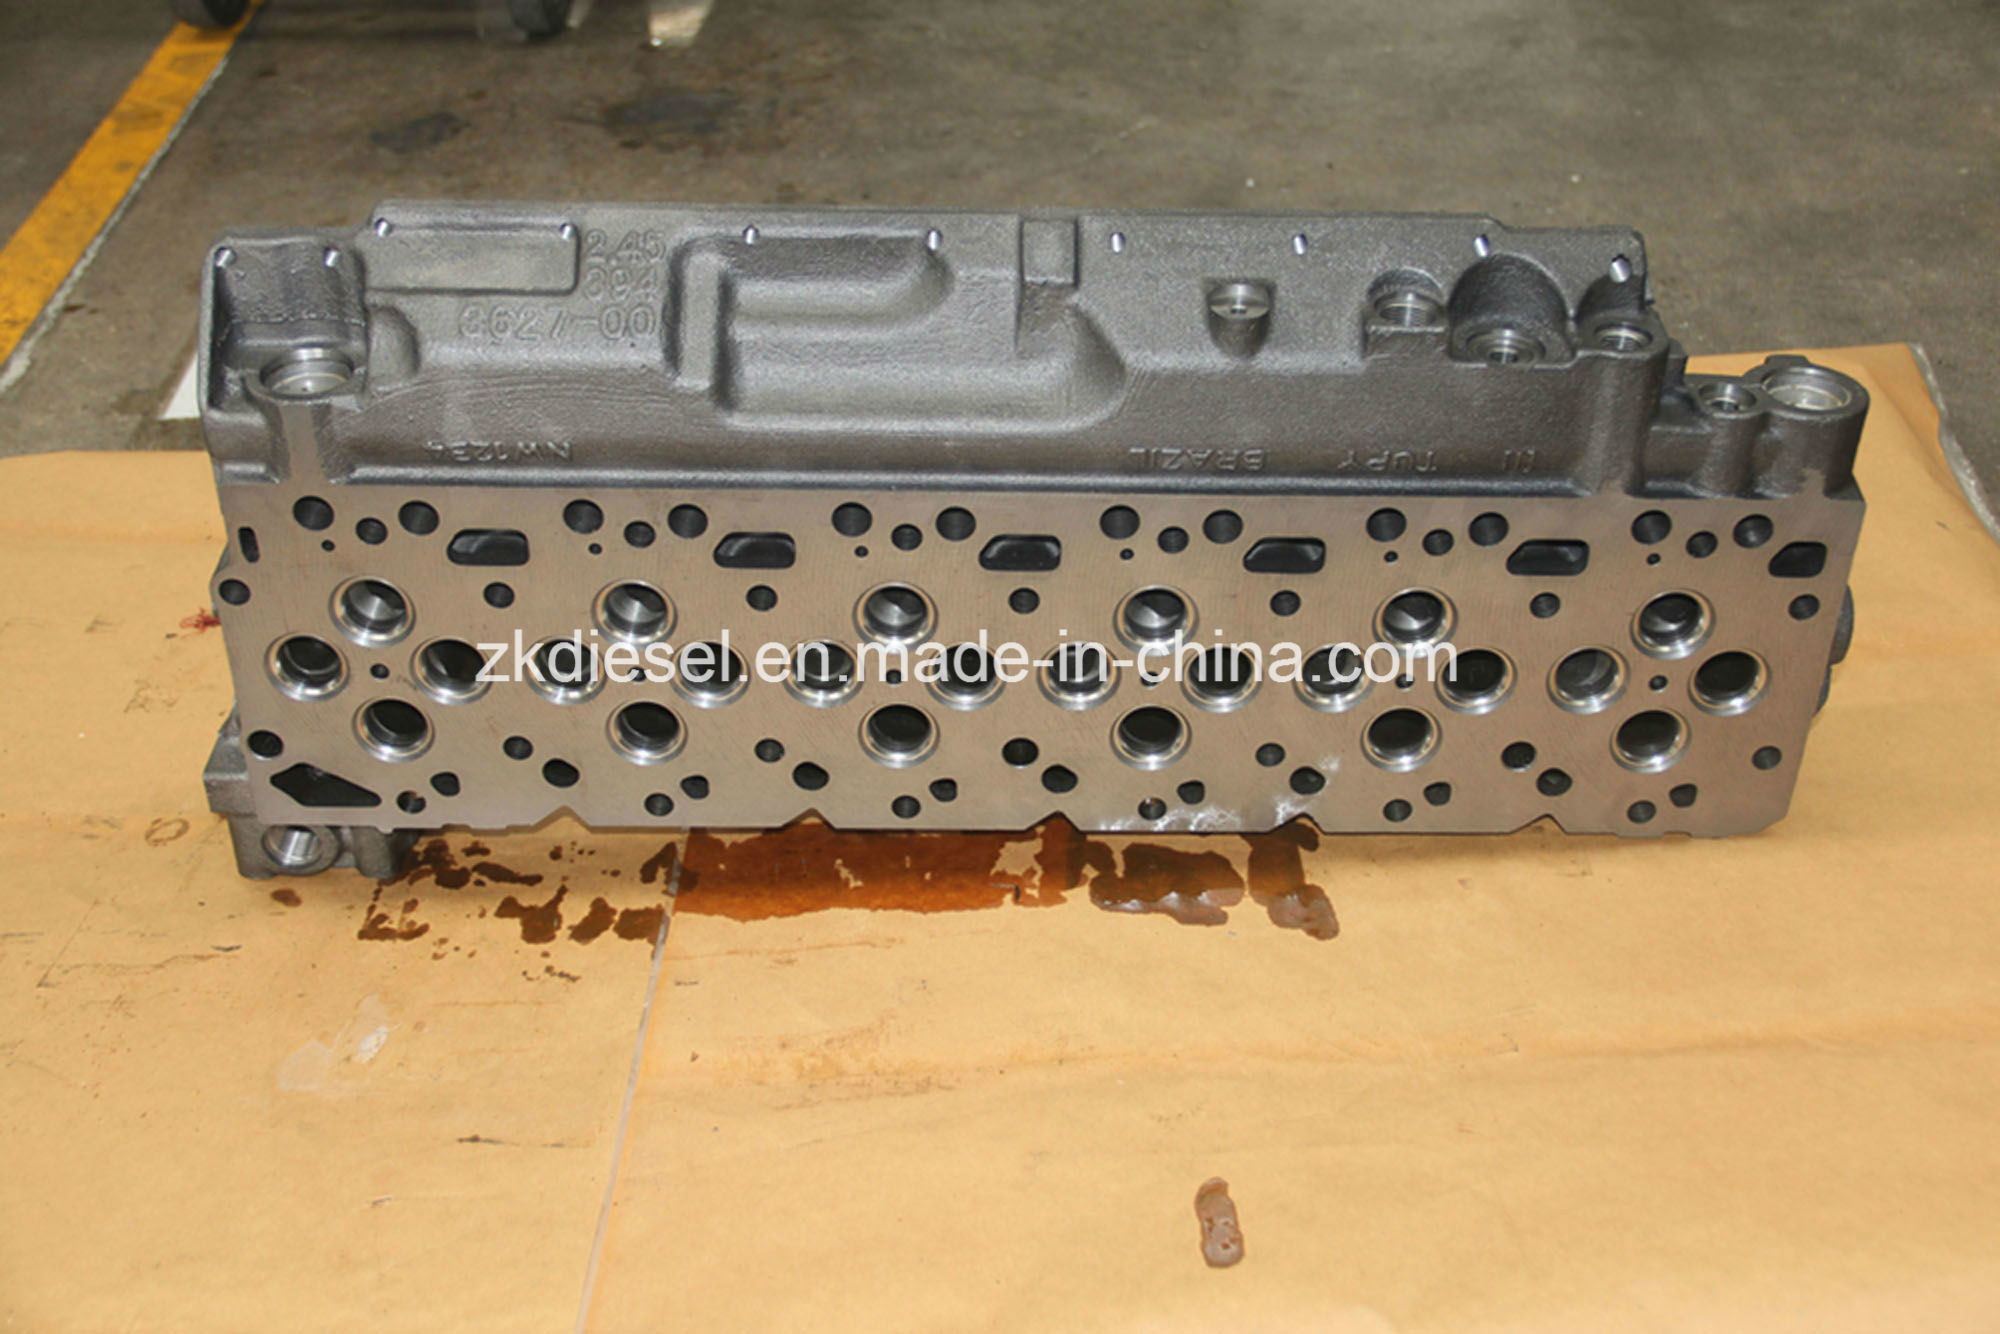 Cummins Spare Parts 3943627/3117225/2831279/2831274/3957384/3957385/5282712/3944992 Isb5.9 Engine Bare Cylinder Head